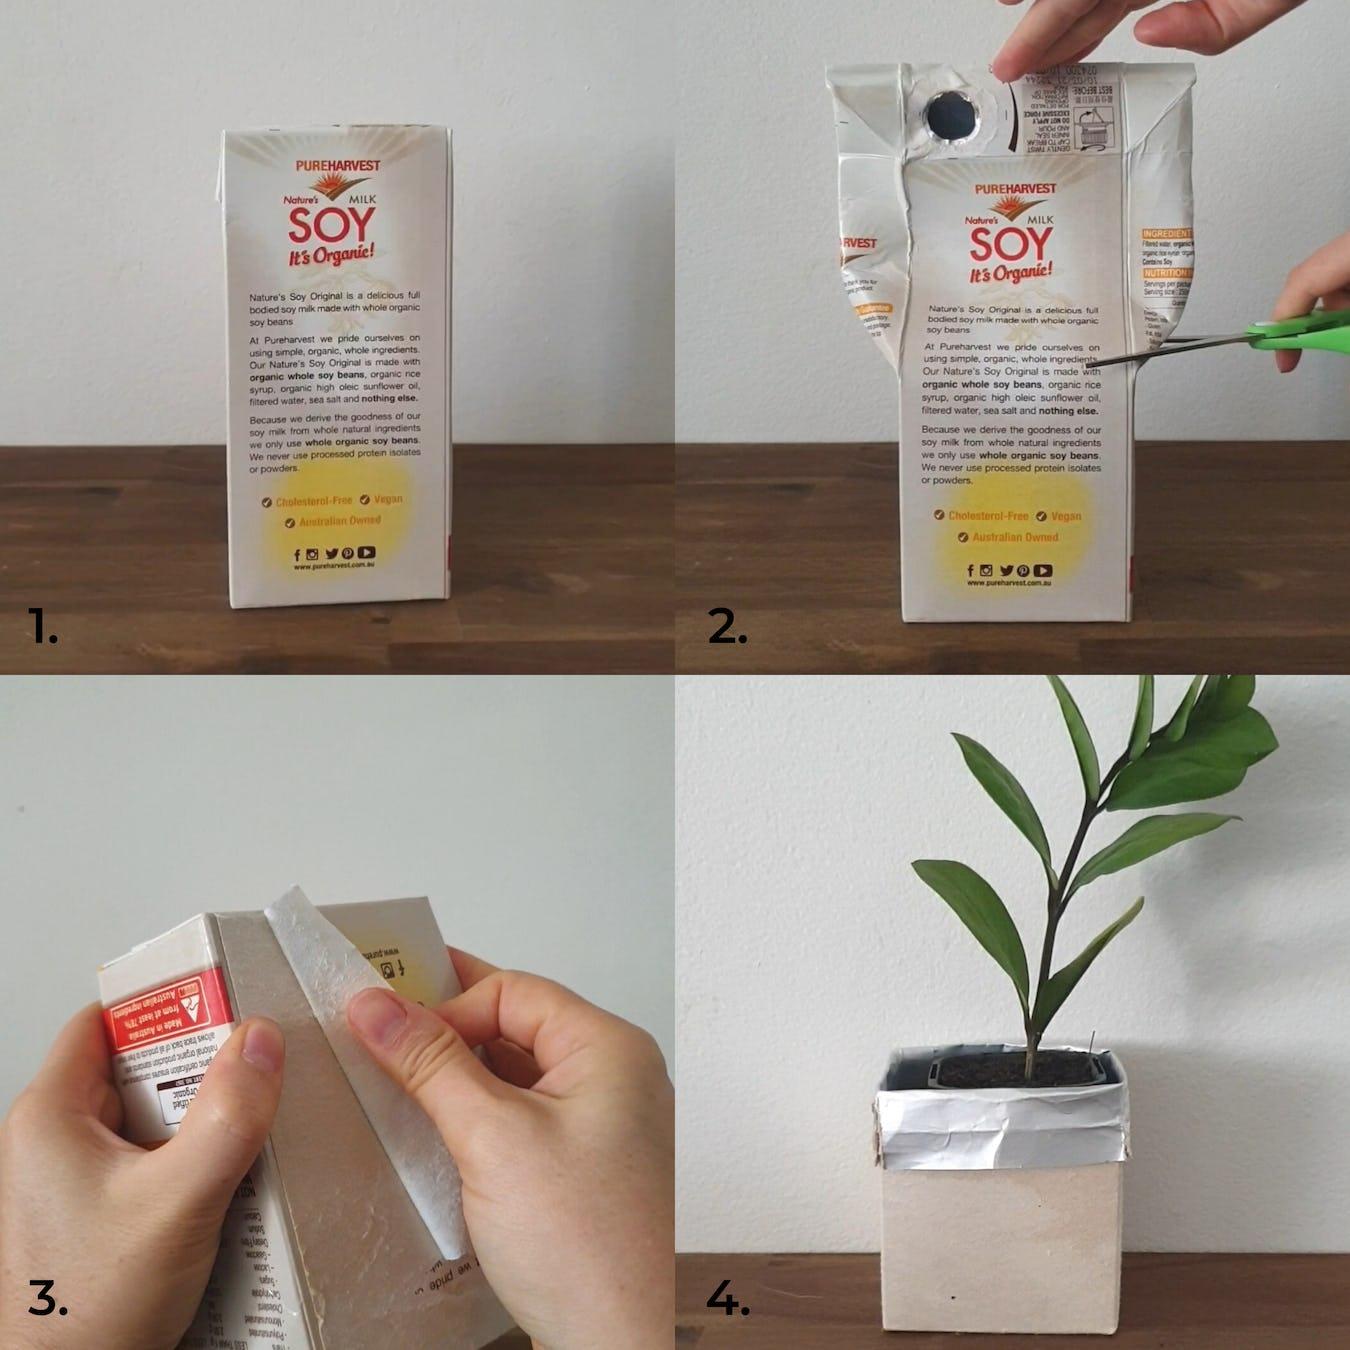 Tetra Pak planter